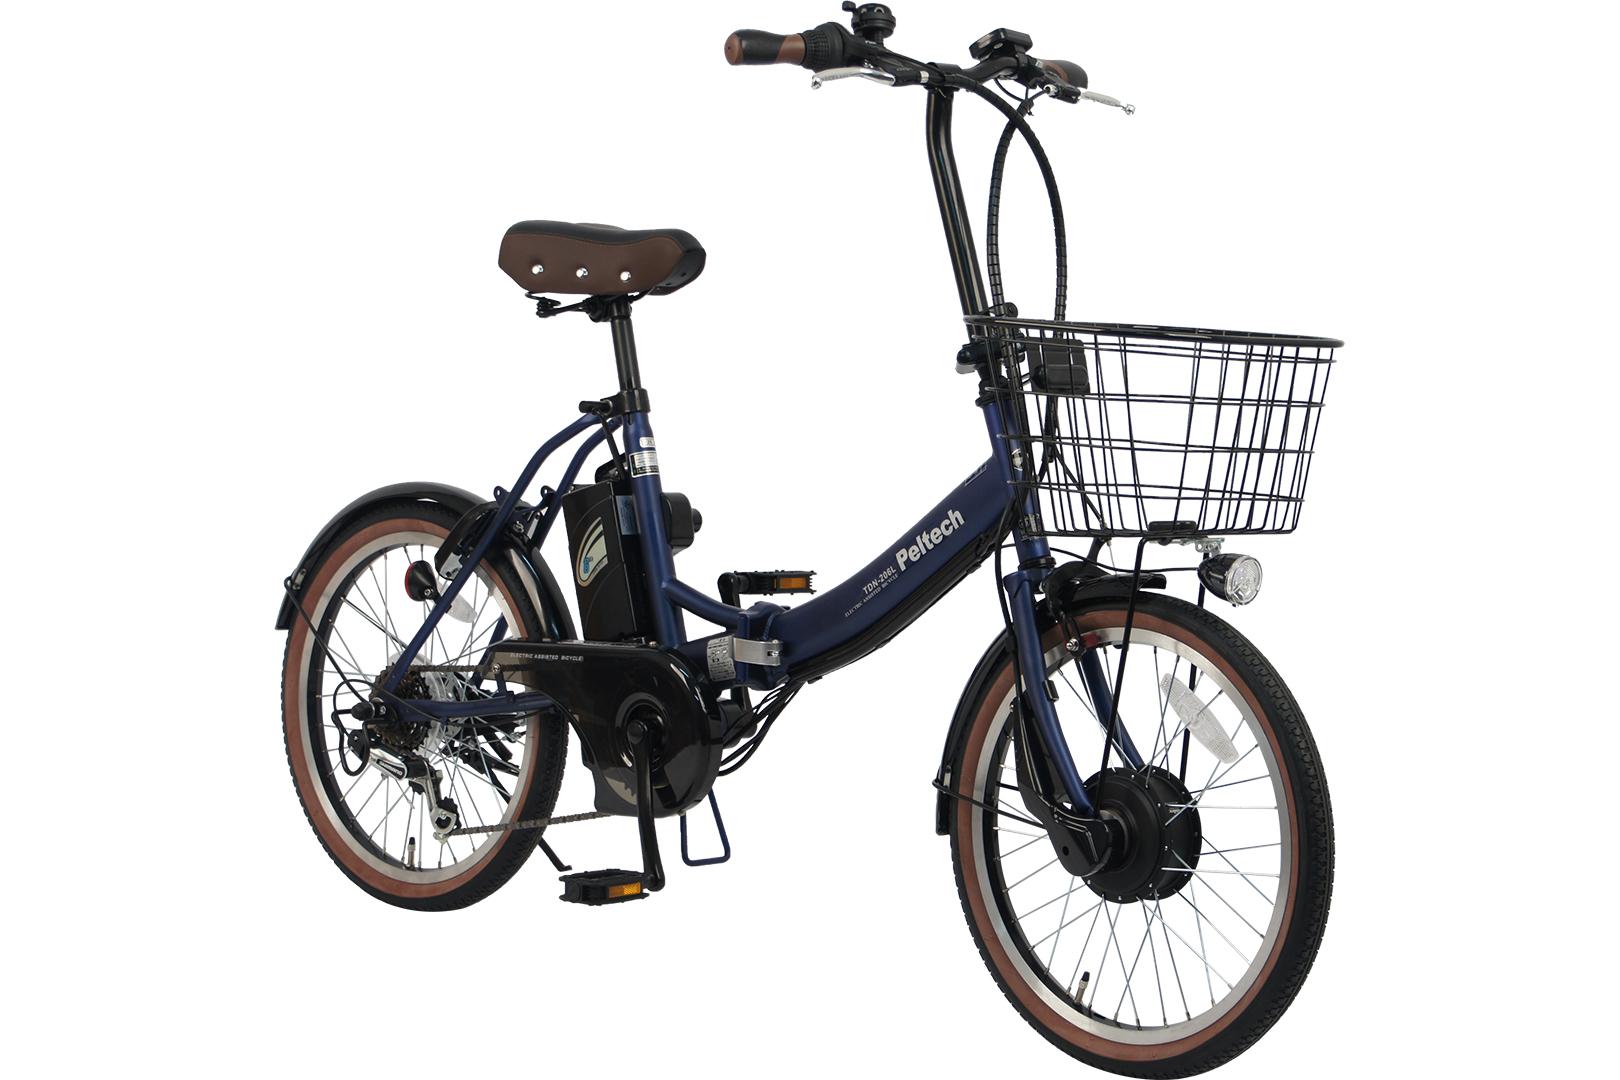 PELTECH ペルテック 折りたたみ電動アシスト自転車 20インチ 外装6段変速 TDN-206 組立必需品